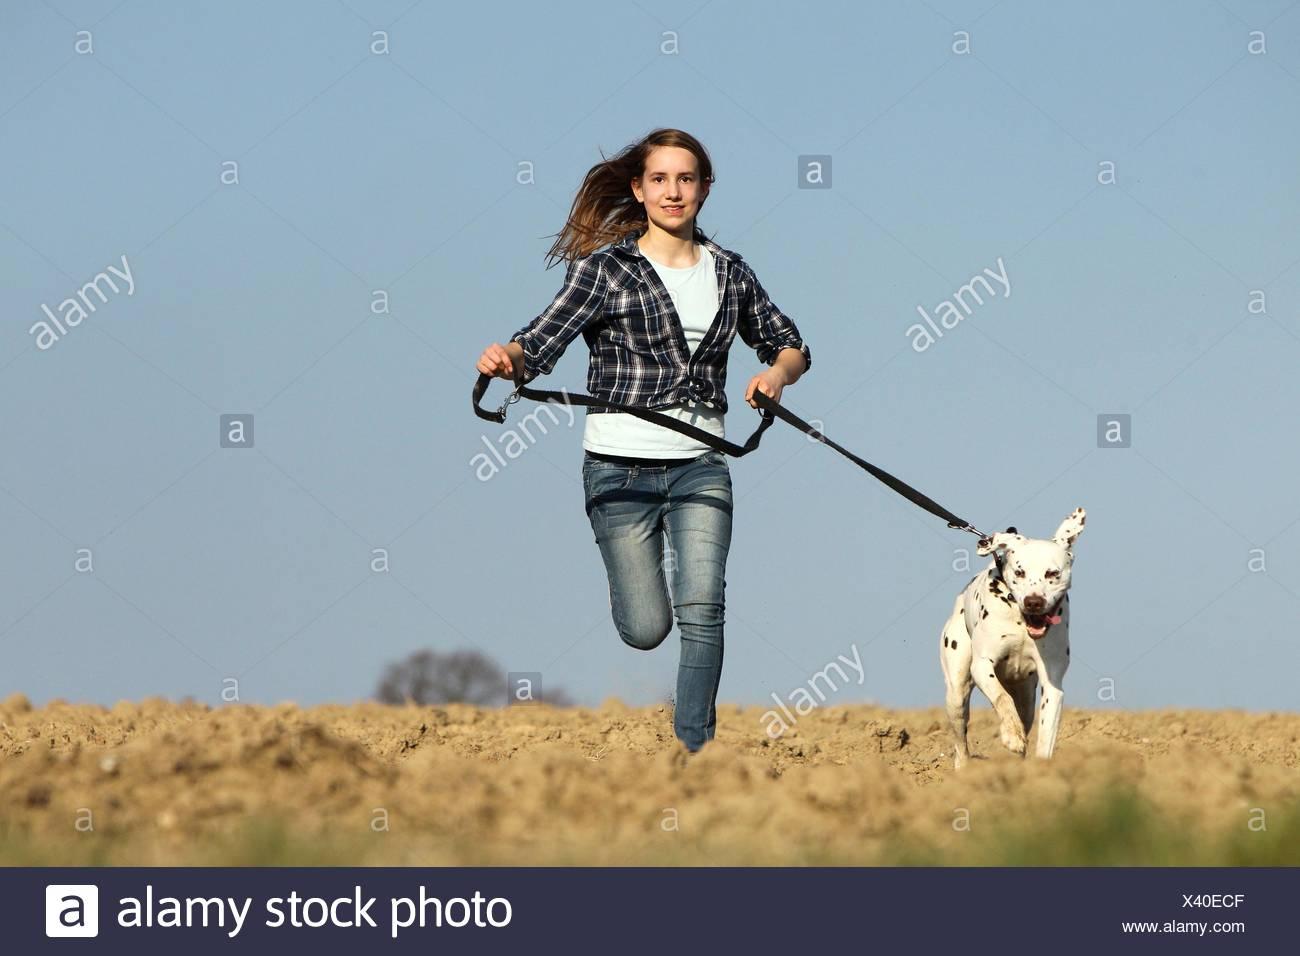 girl with Dalmatian - Stock Image